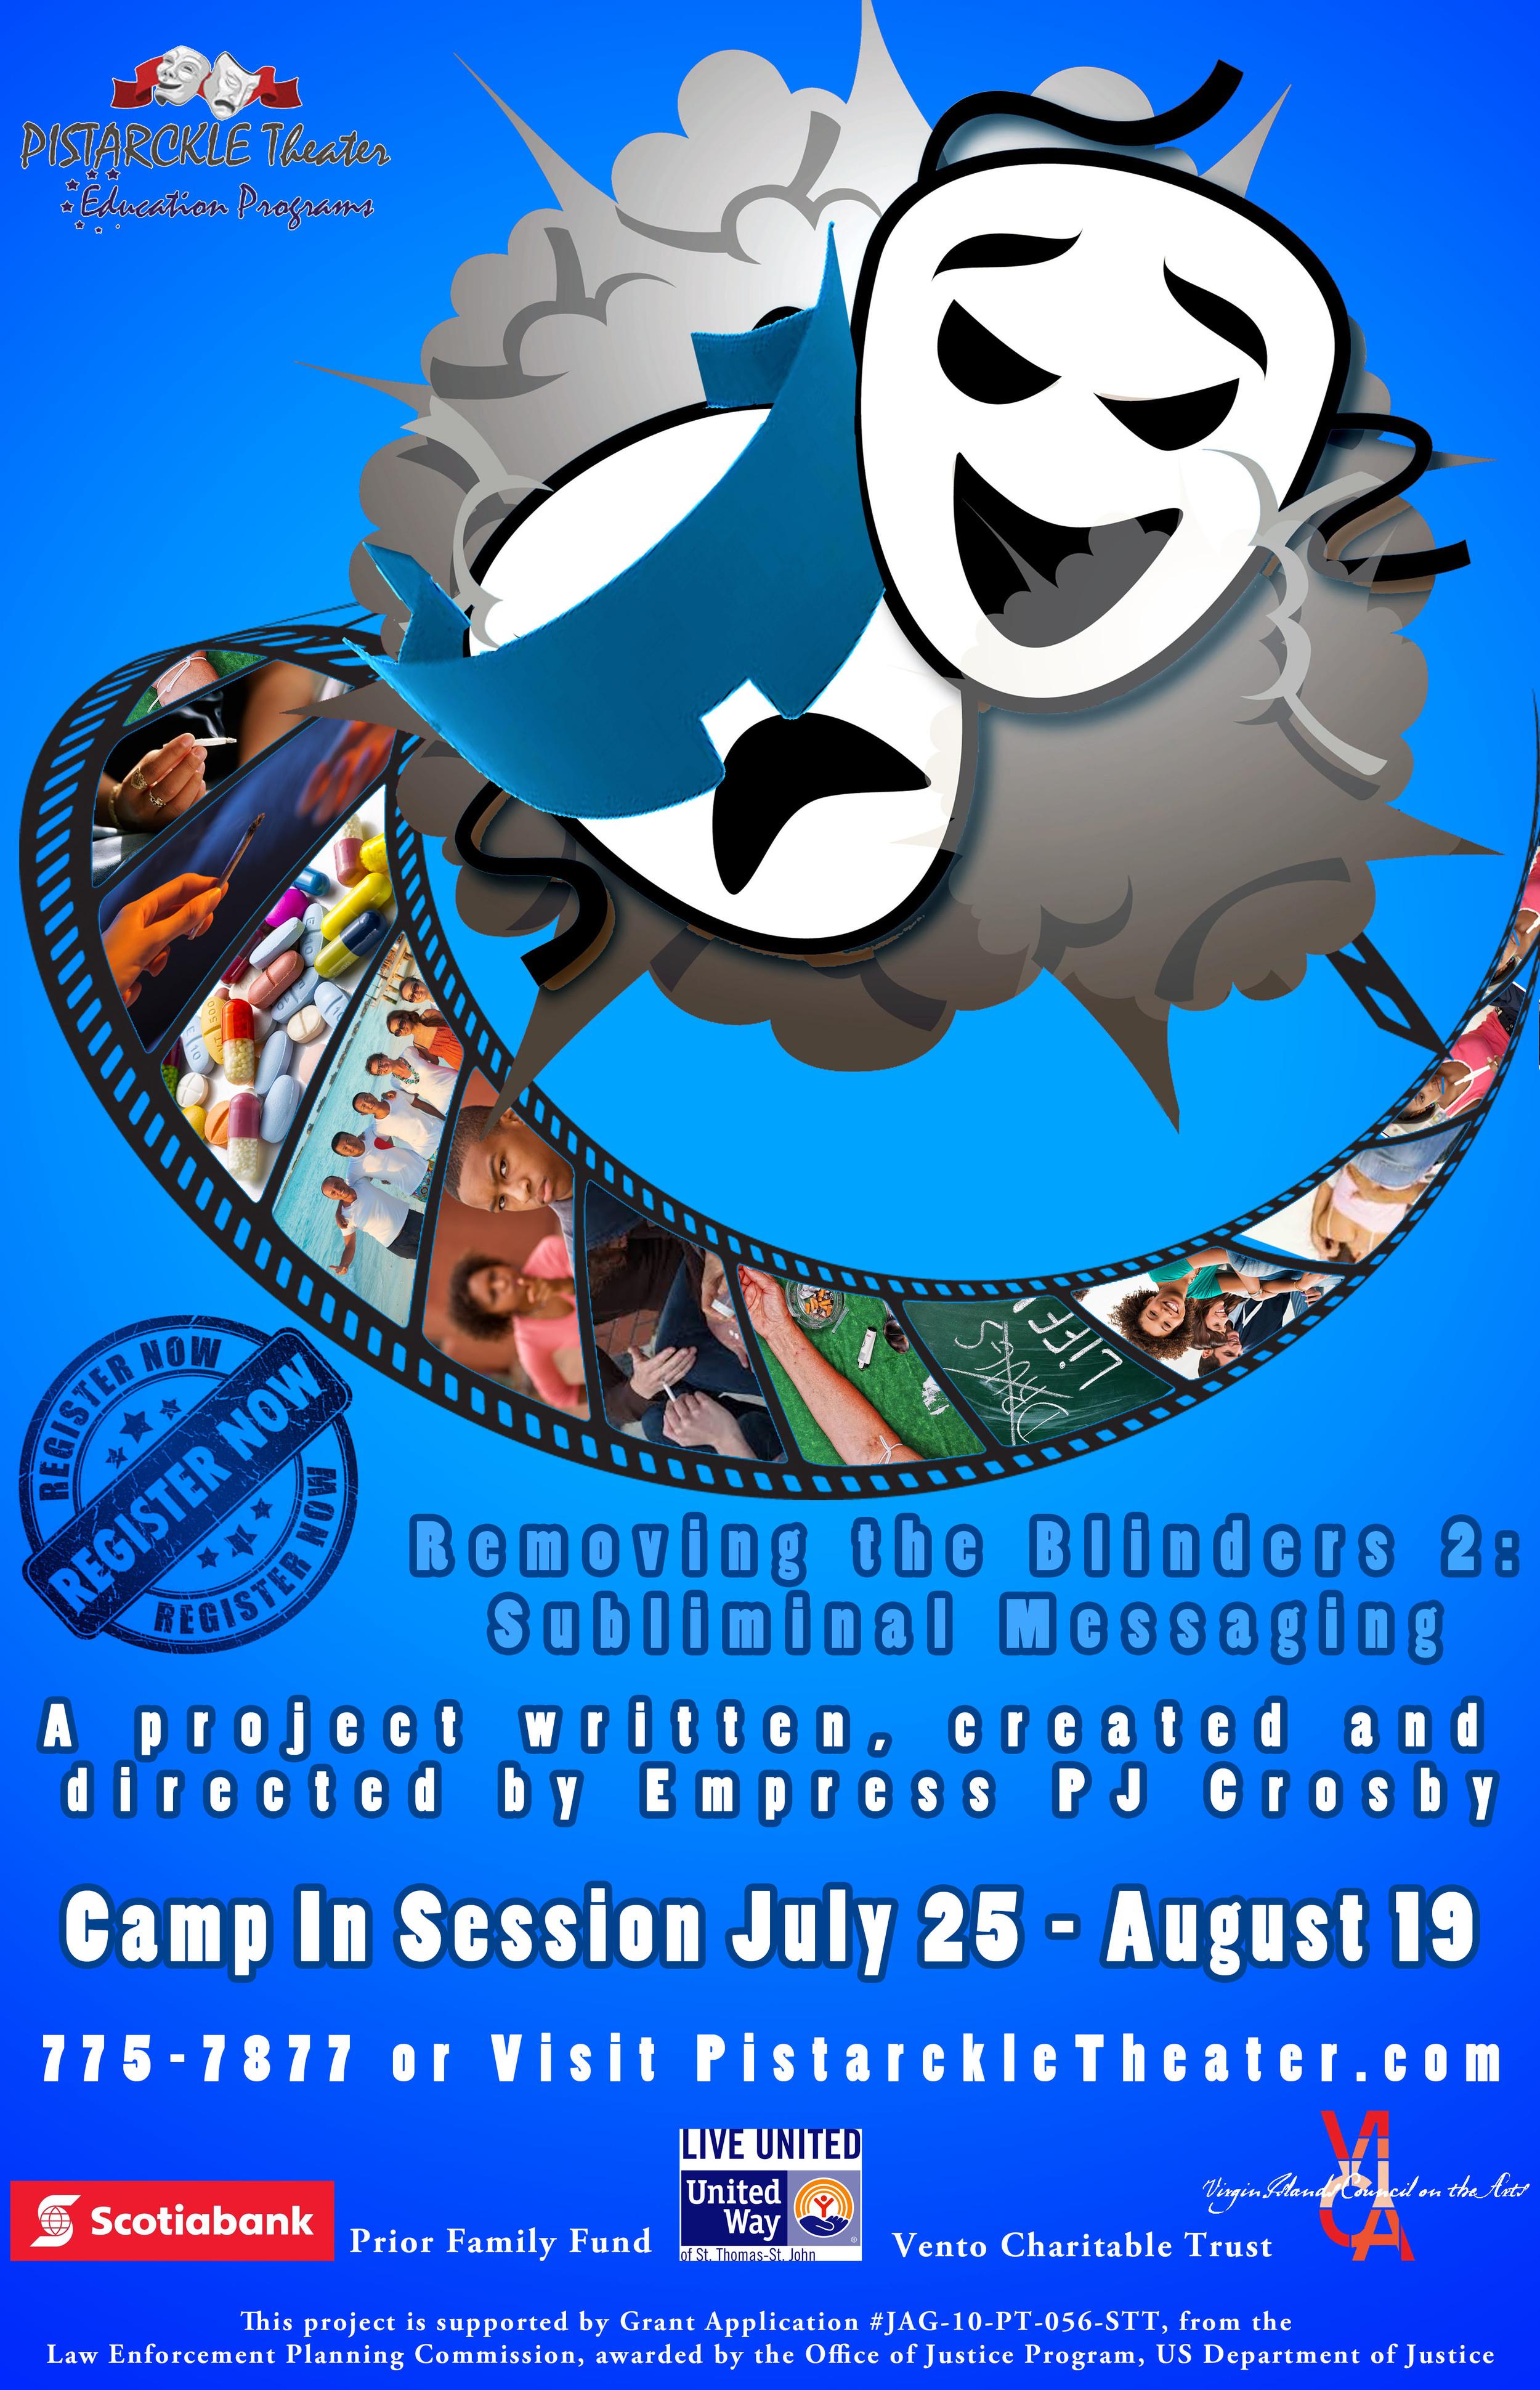 Leadership Camp at Pistarckle - Live Entertainment on St. Thomas, USVI